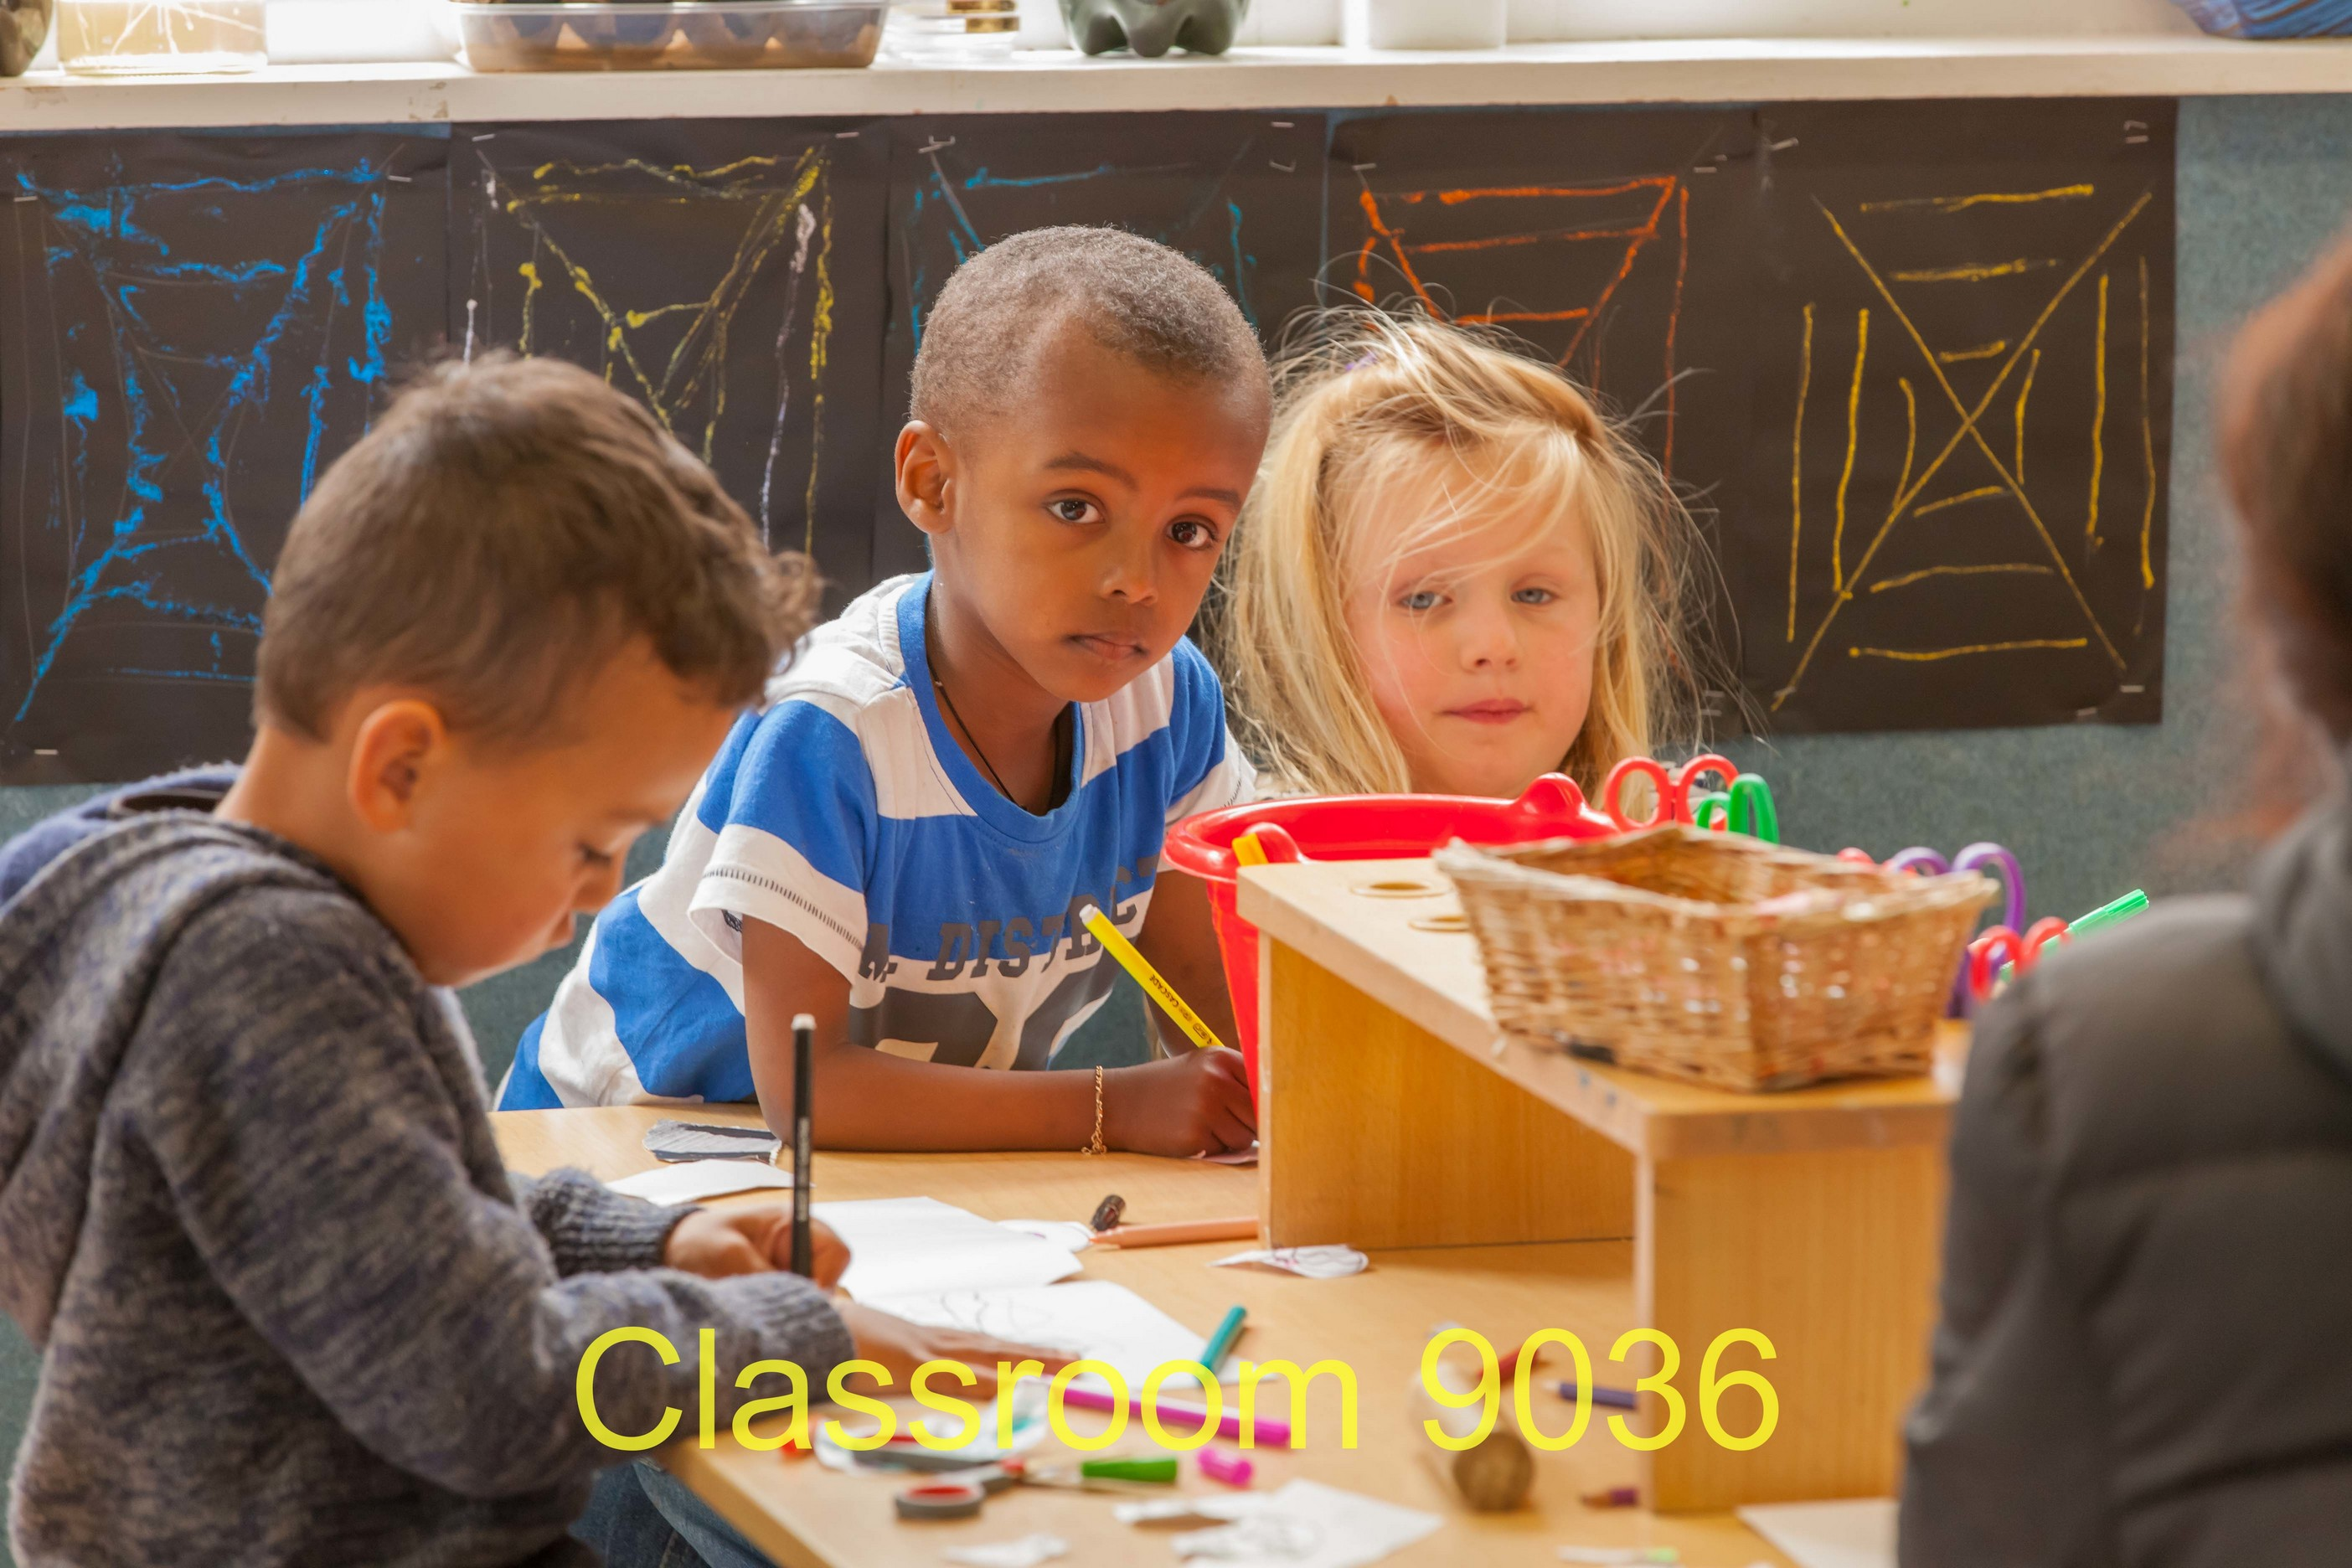 Classroom 9036